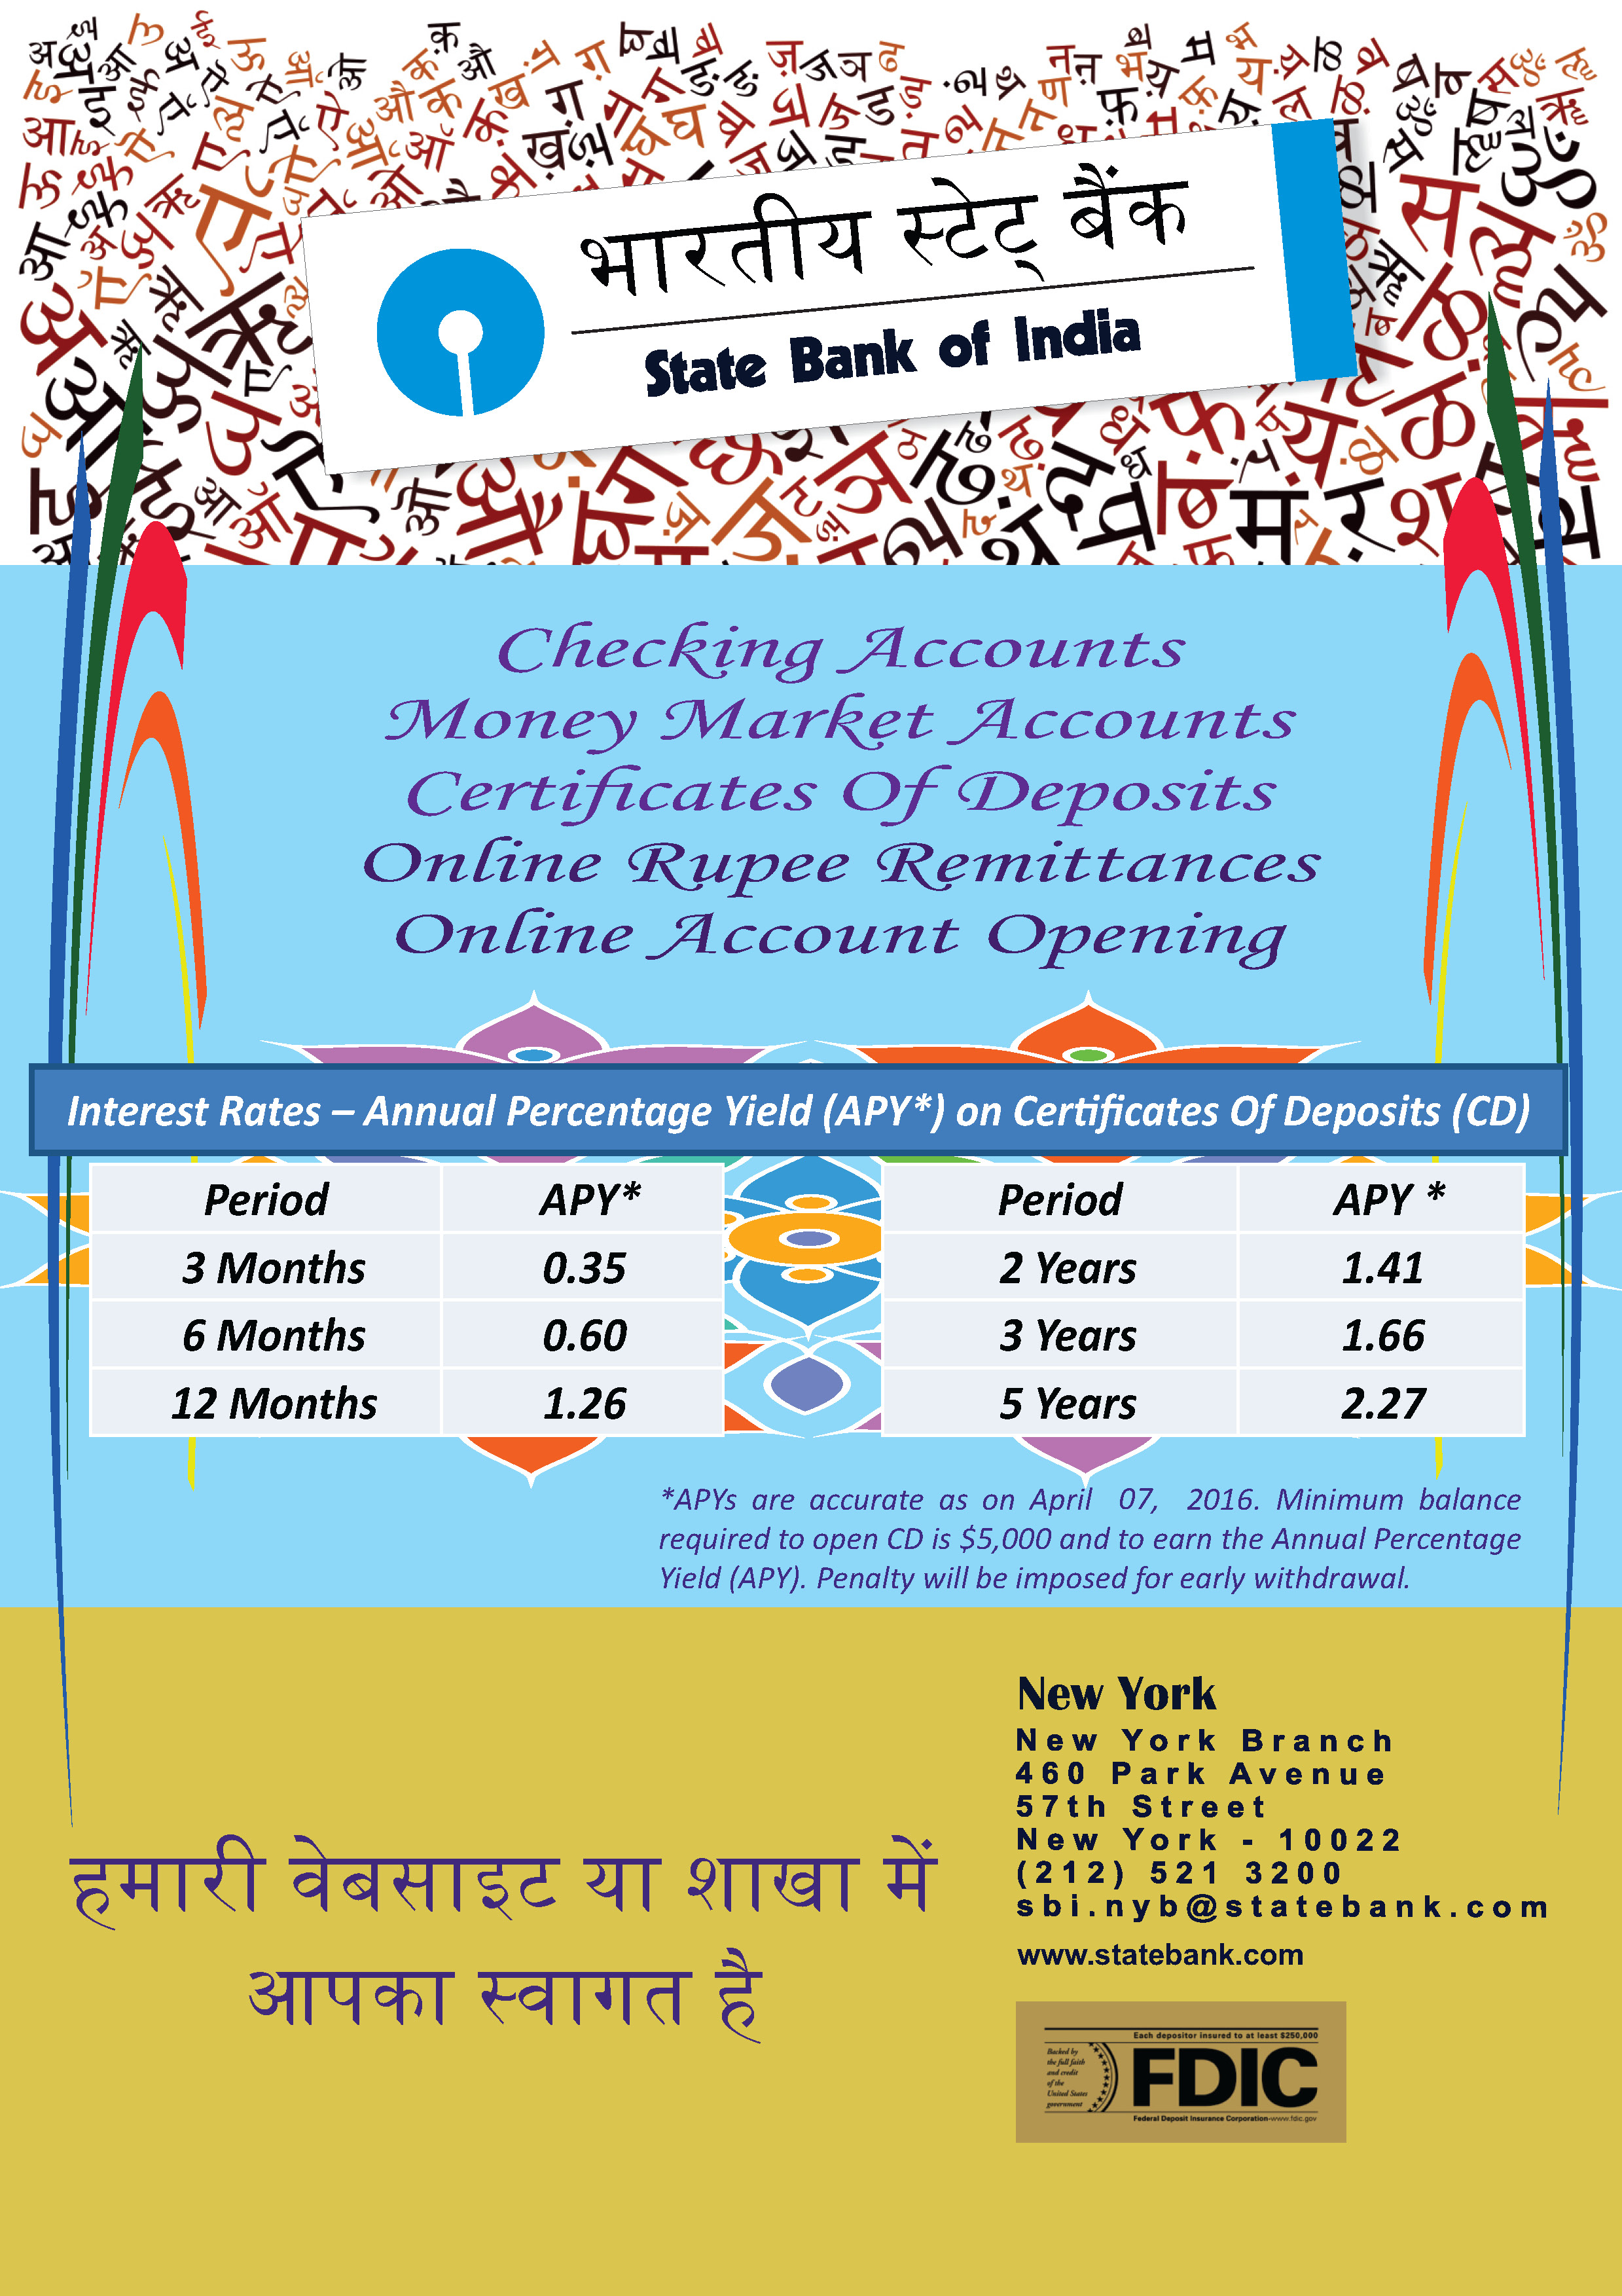 StateBankofIndia_Sponsors_InternationalHindiConference.jpg